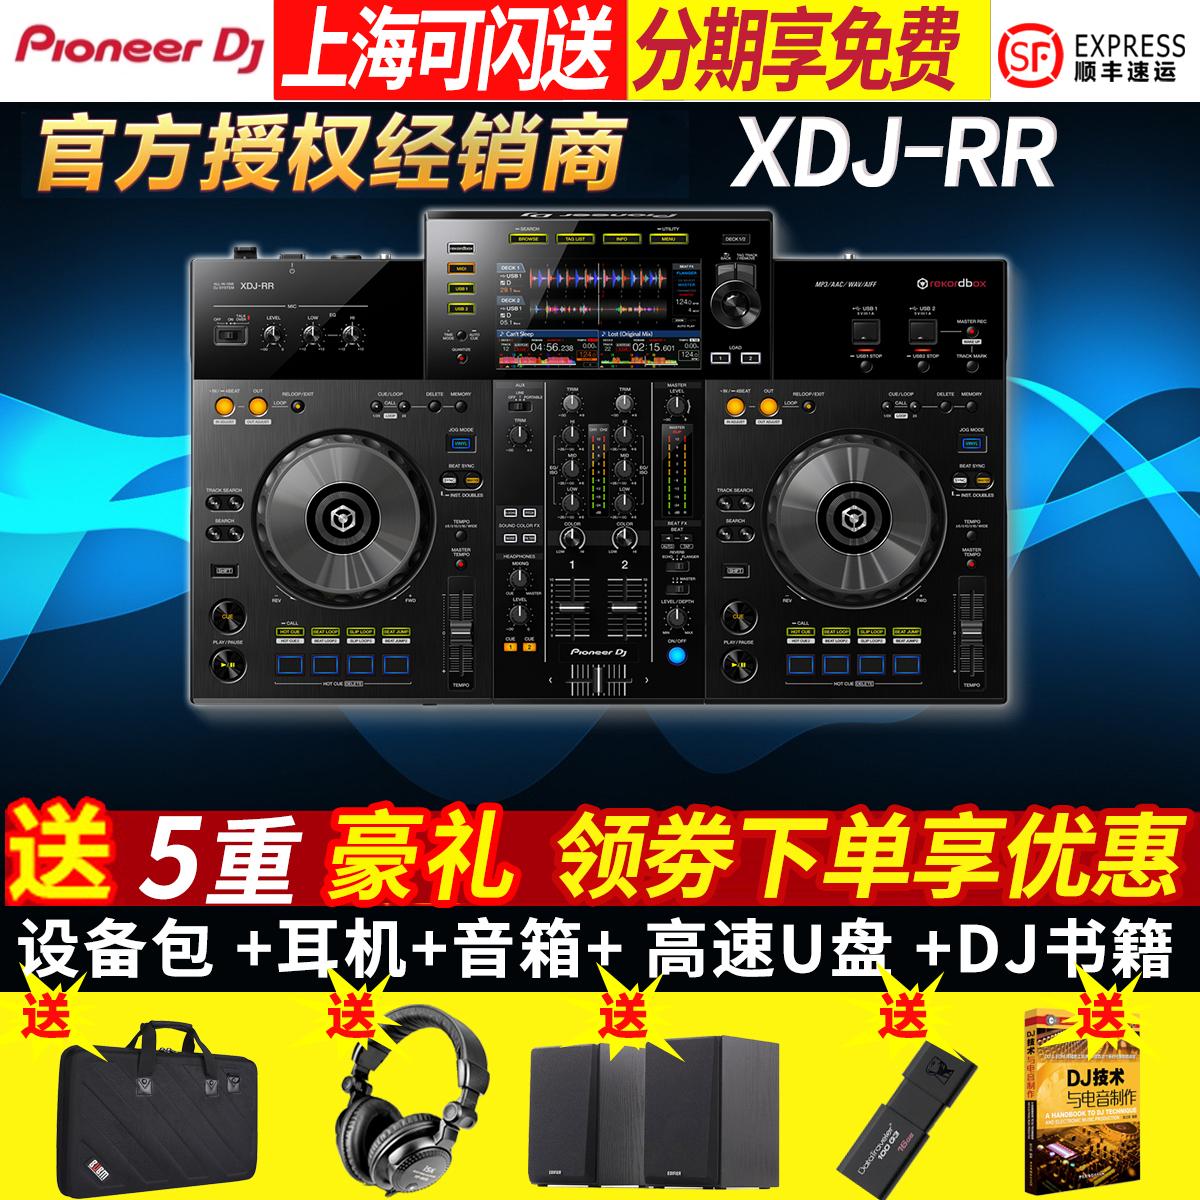 DJ установки / микшеры Артикул 578674786779